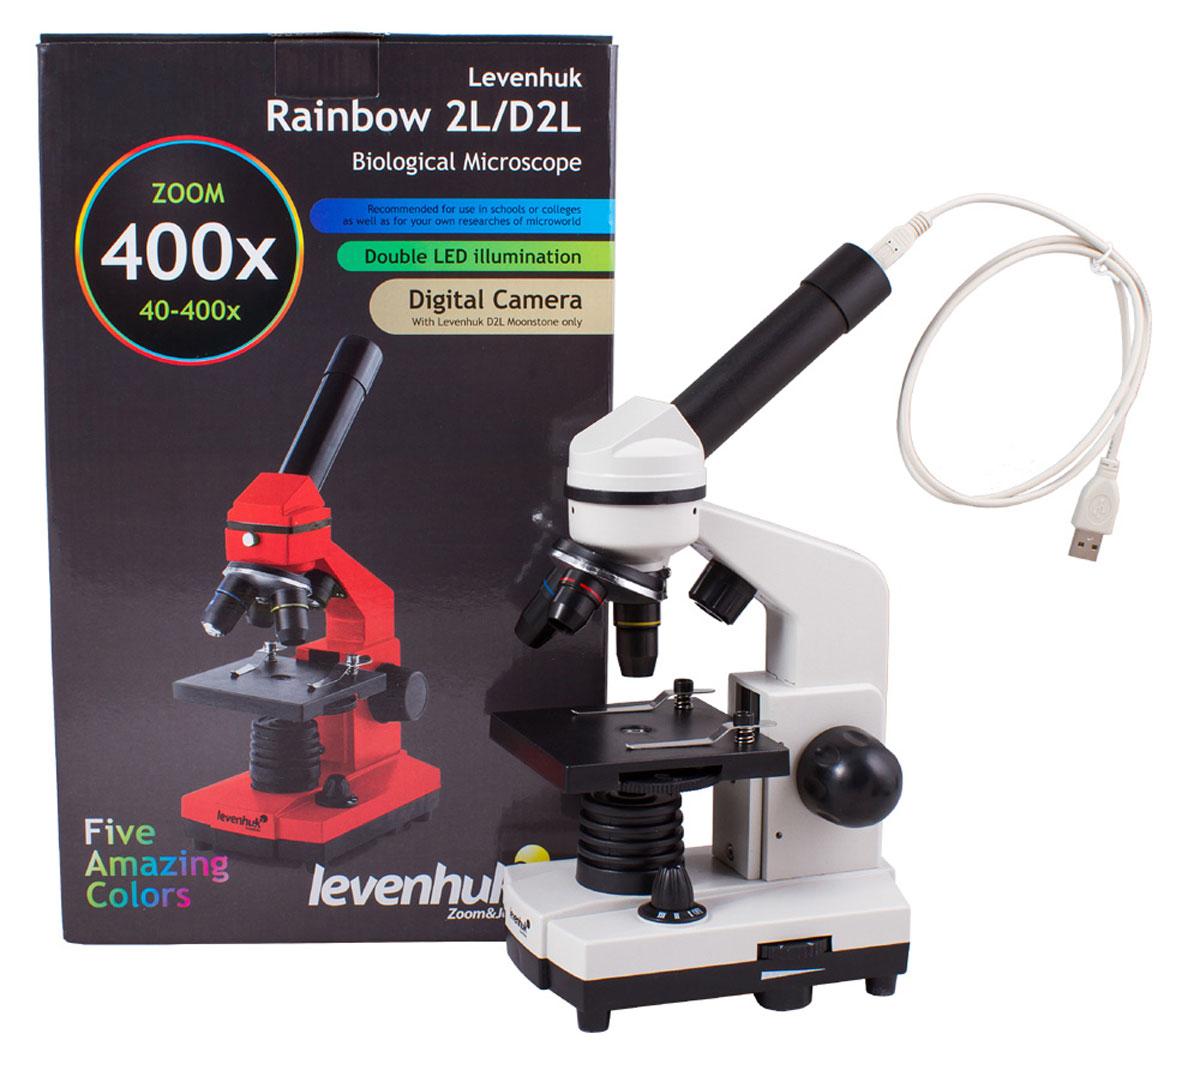 Levenhuk Rainbow D2L Moonstone микроскоп